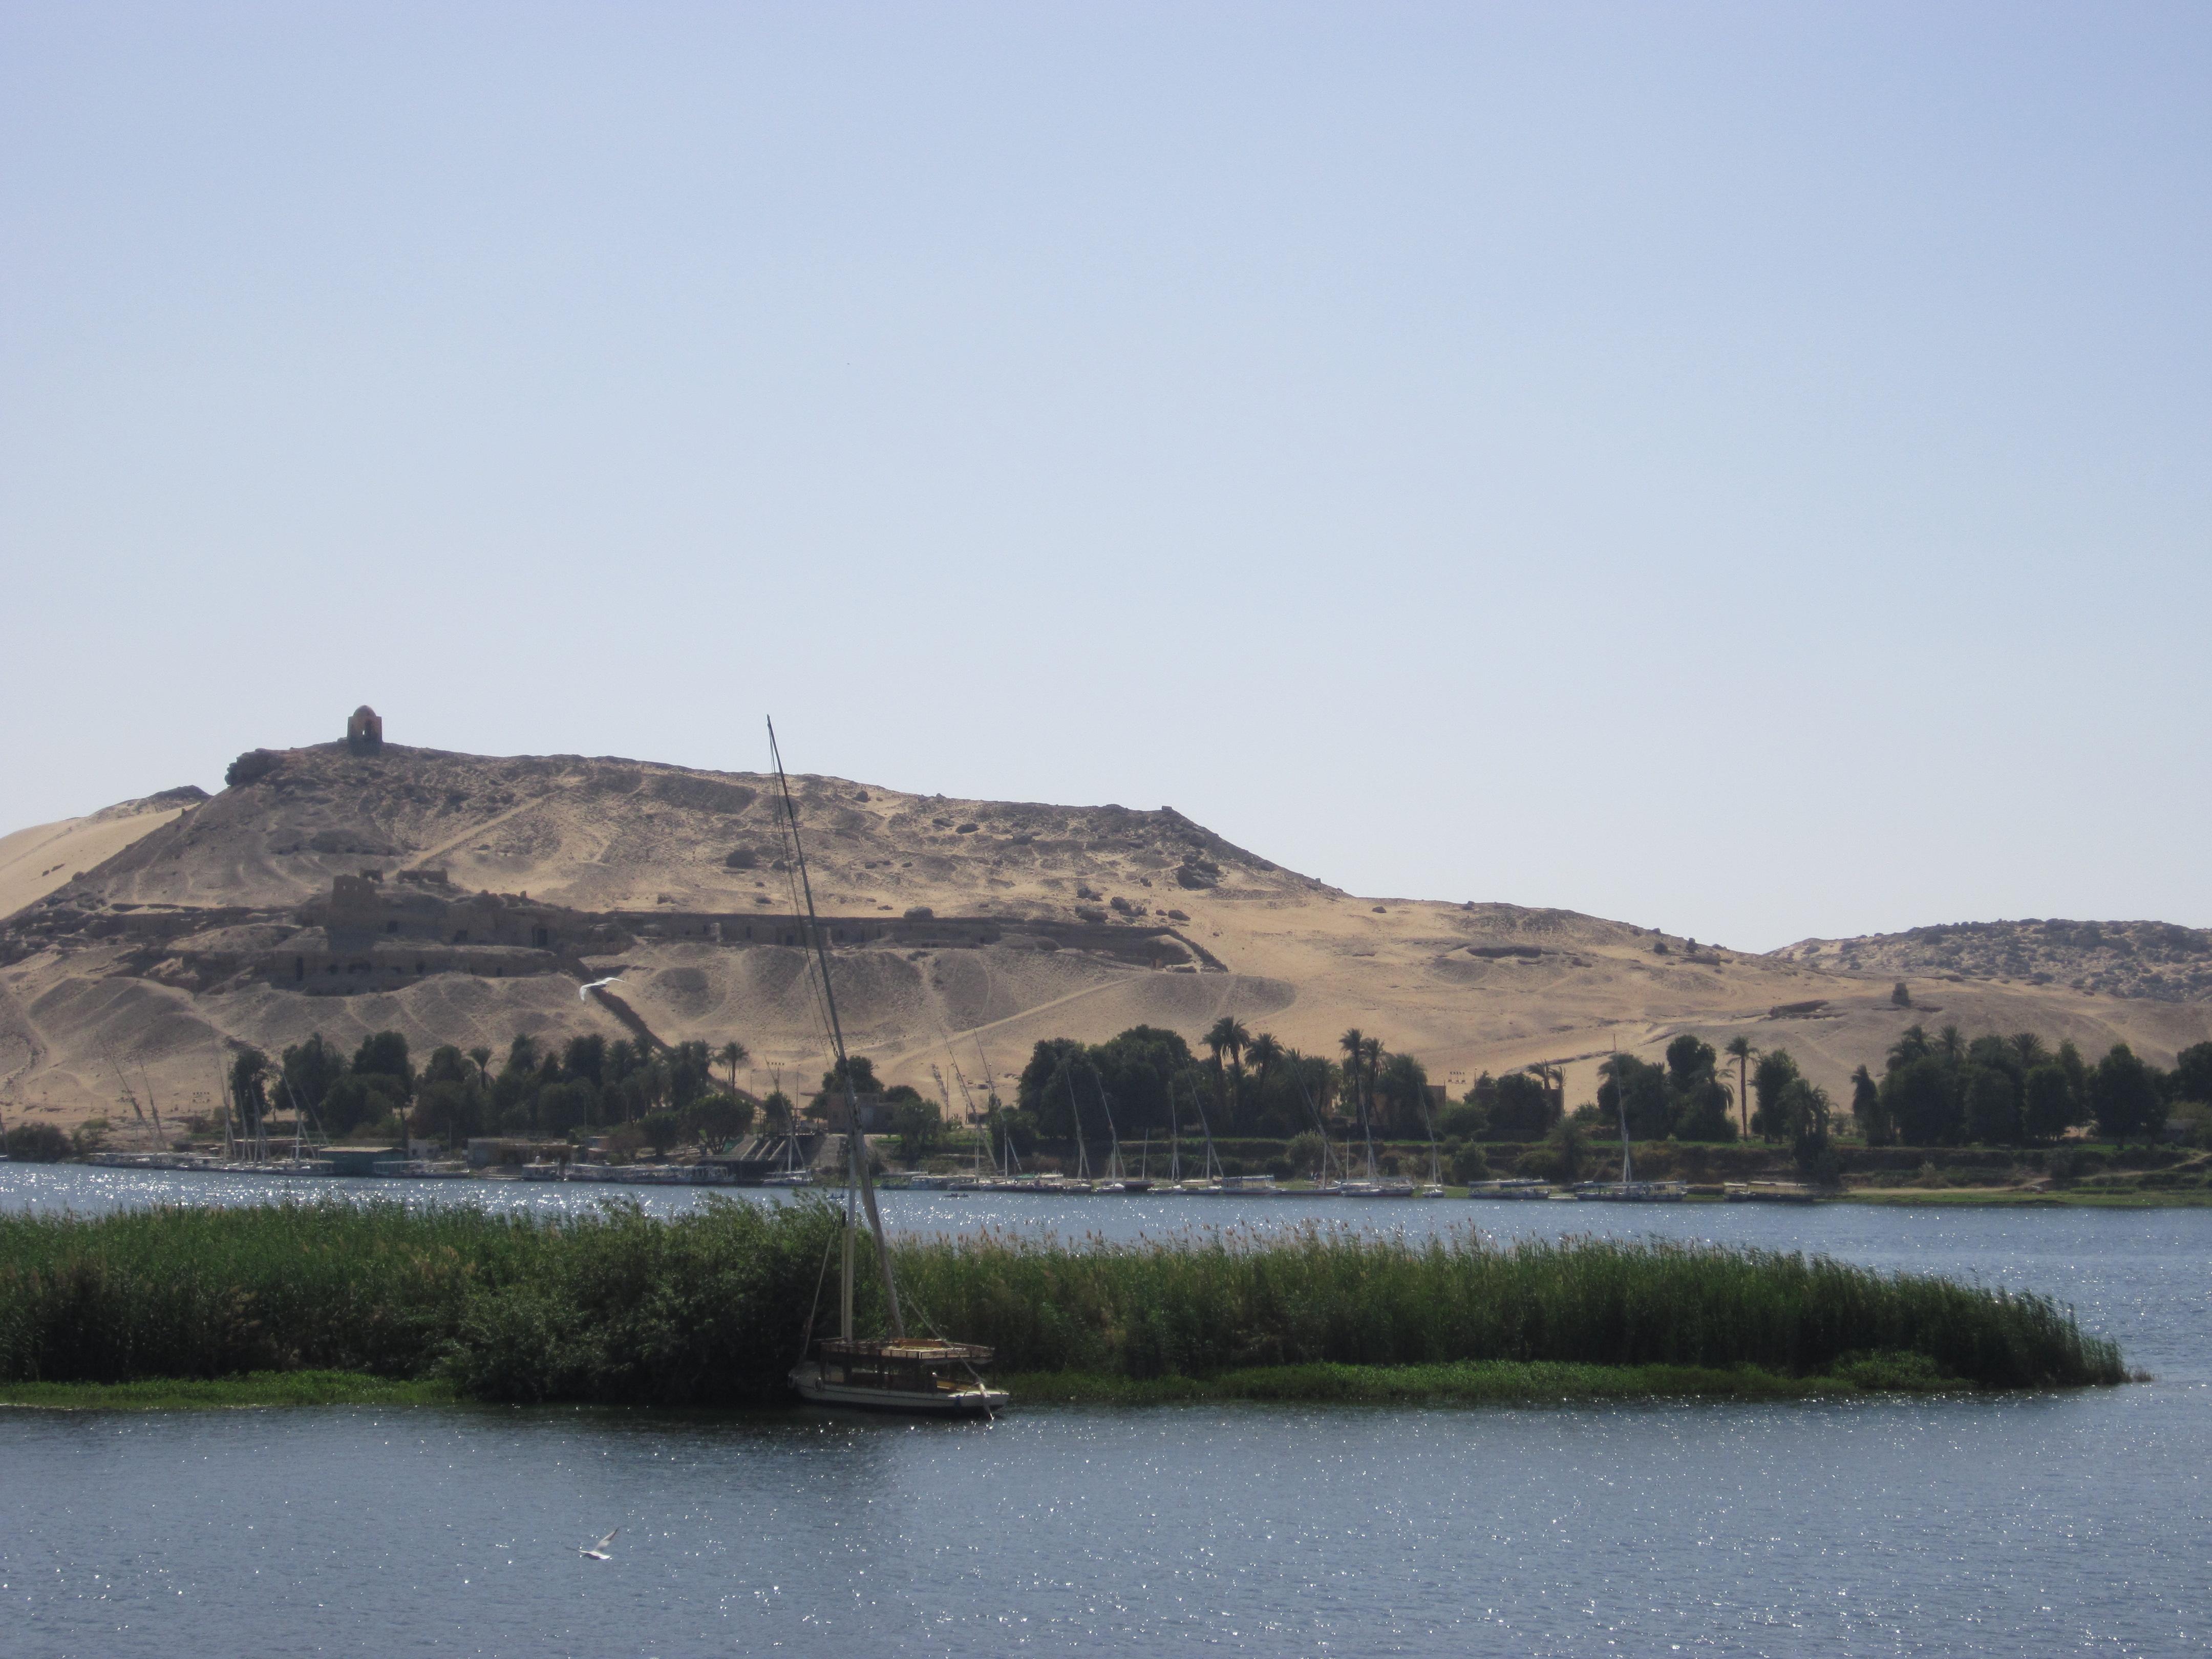 #egypt #egypttourism #rivernile